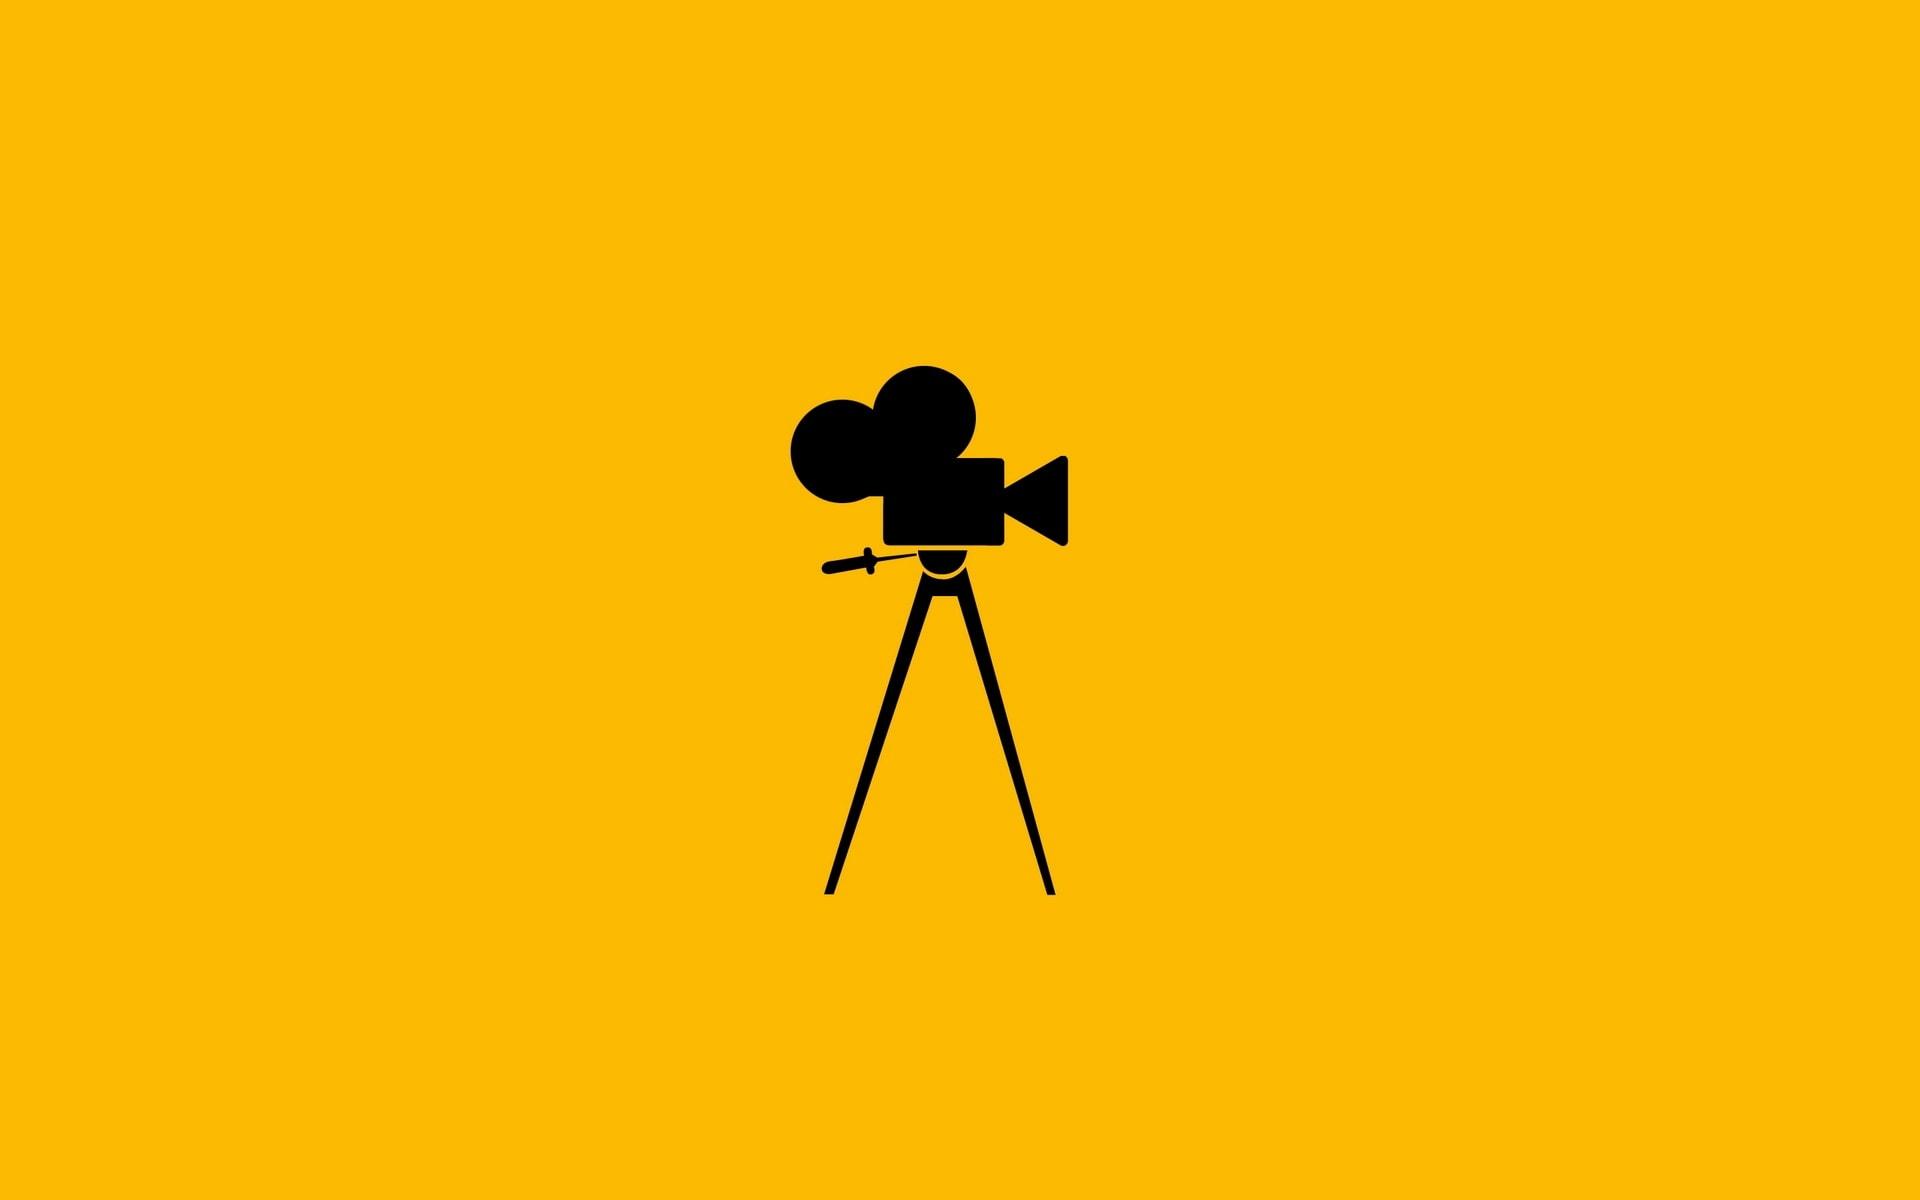 Тест: Угадайте фильм по минималистичному постеру